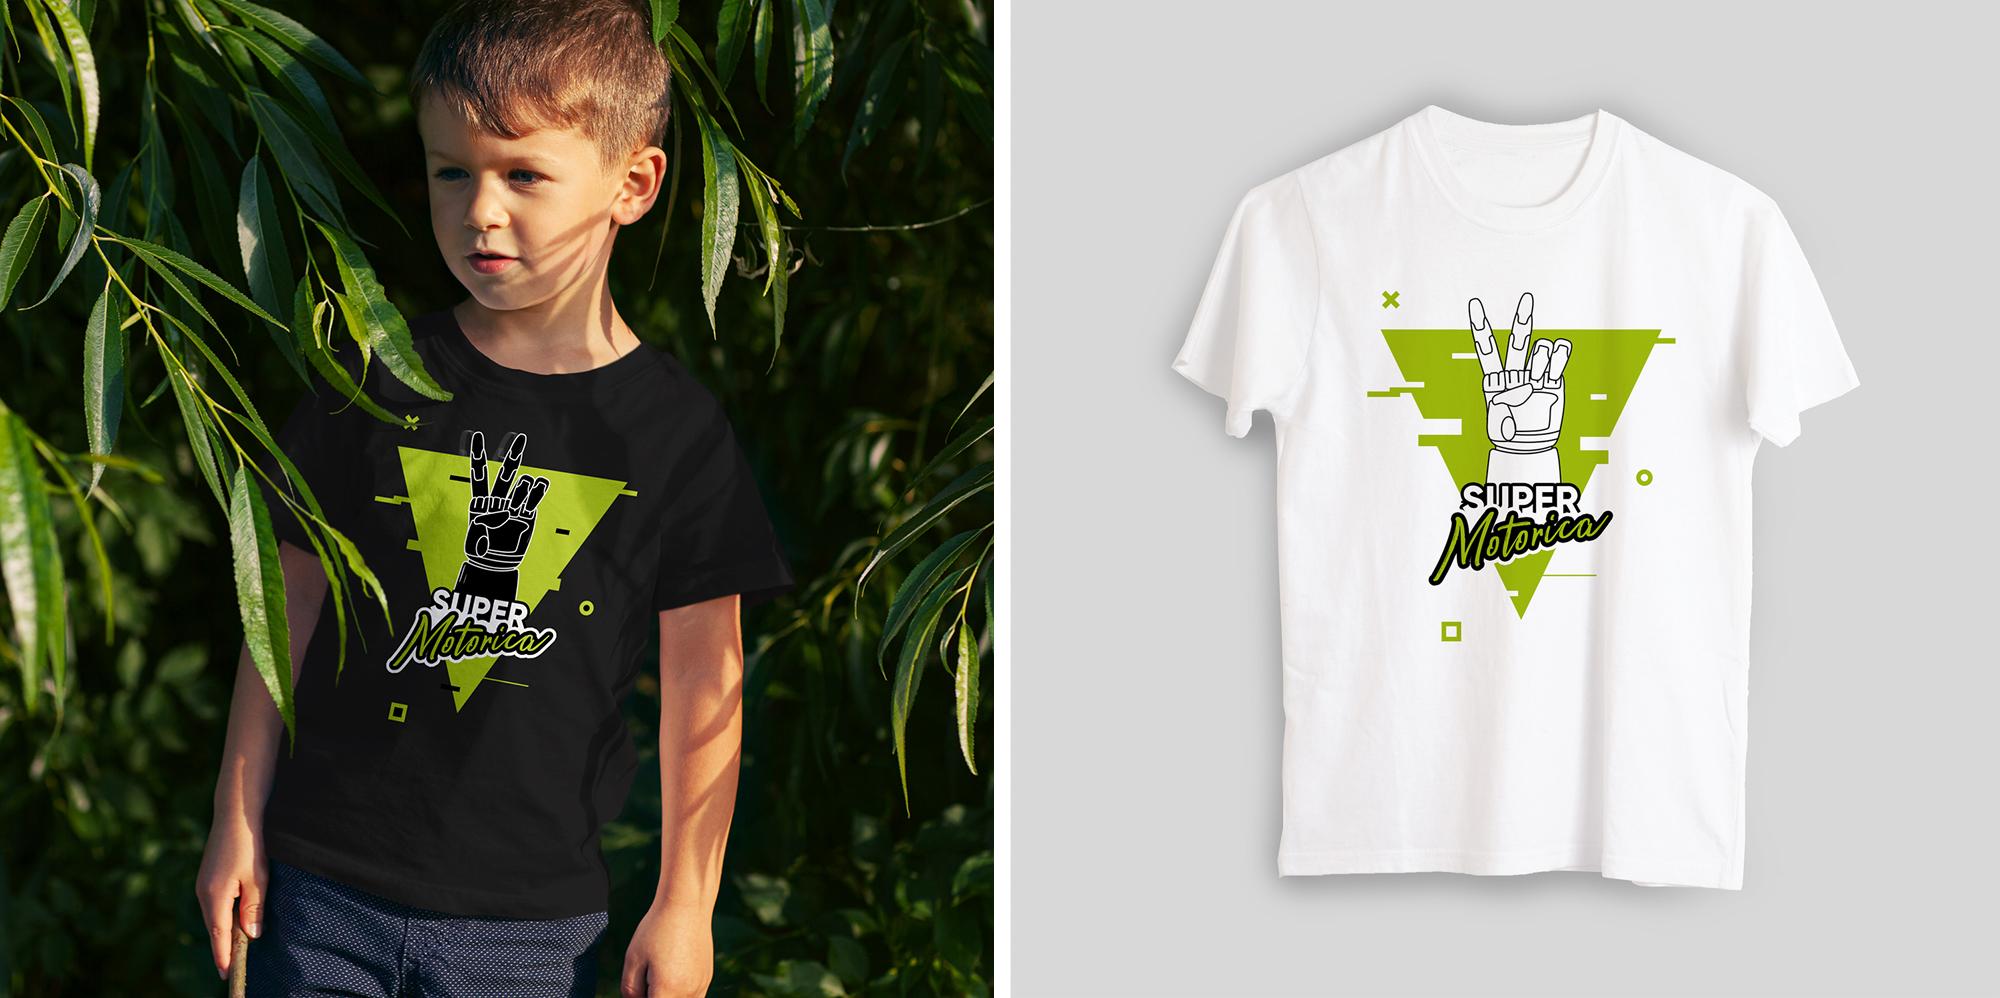 Нарисовать принты на футболки для компании Моторика фото f_00560a185e414a81.jpg